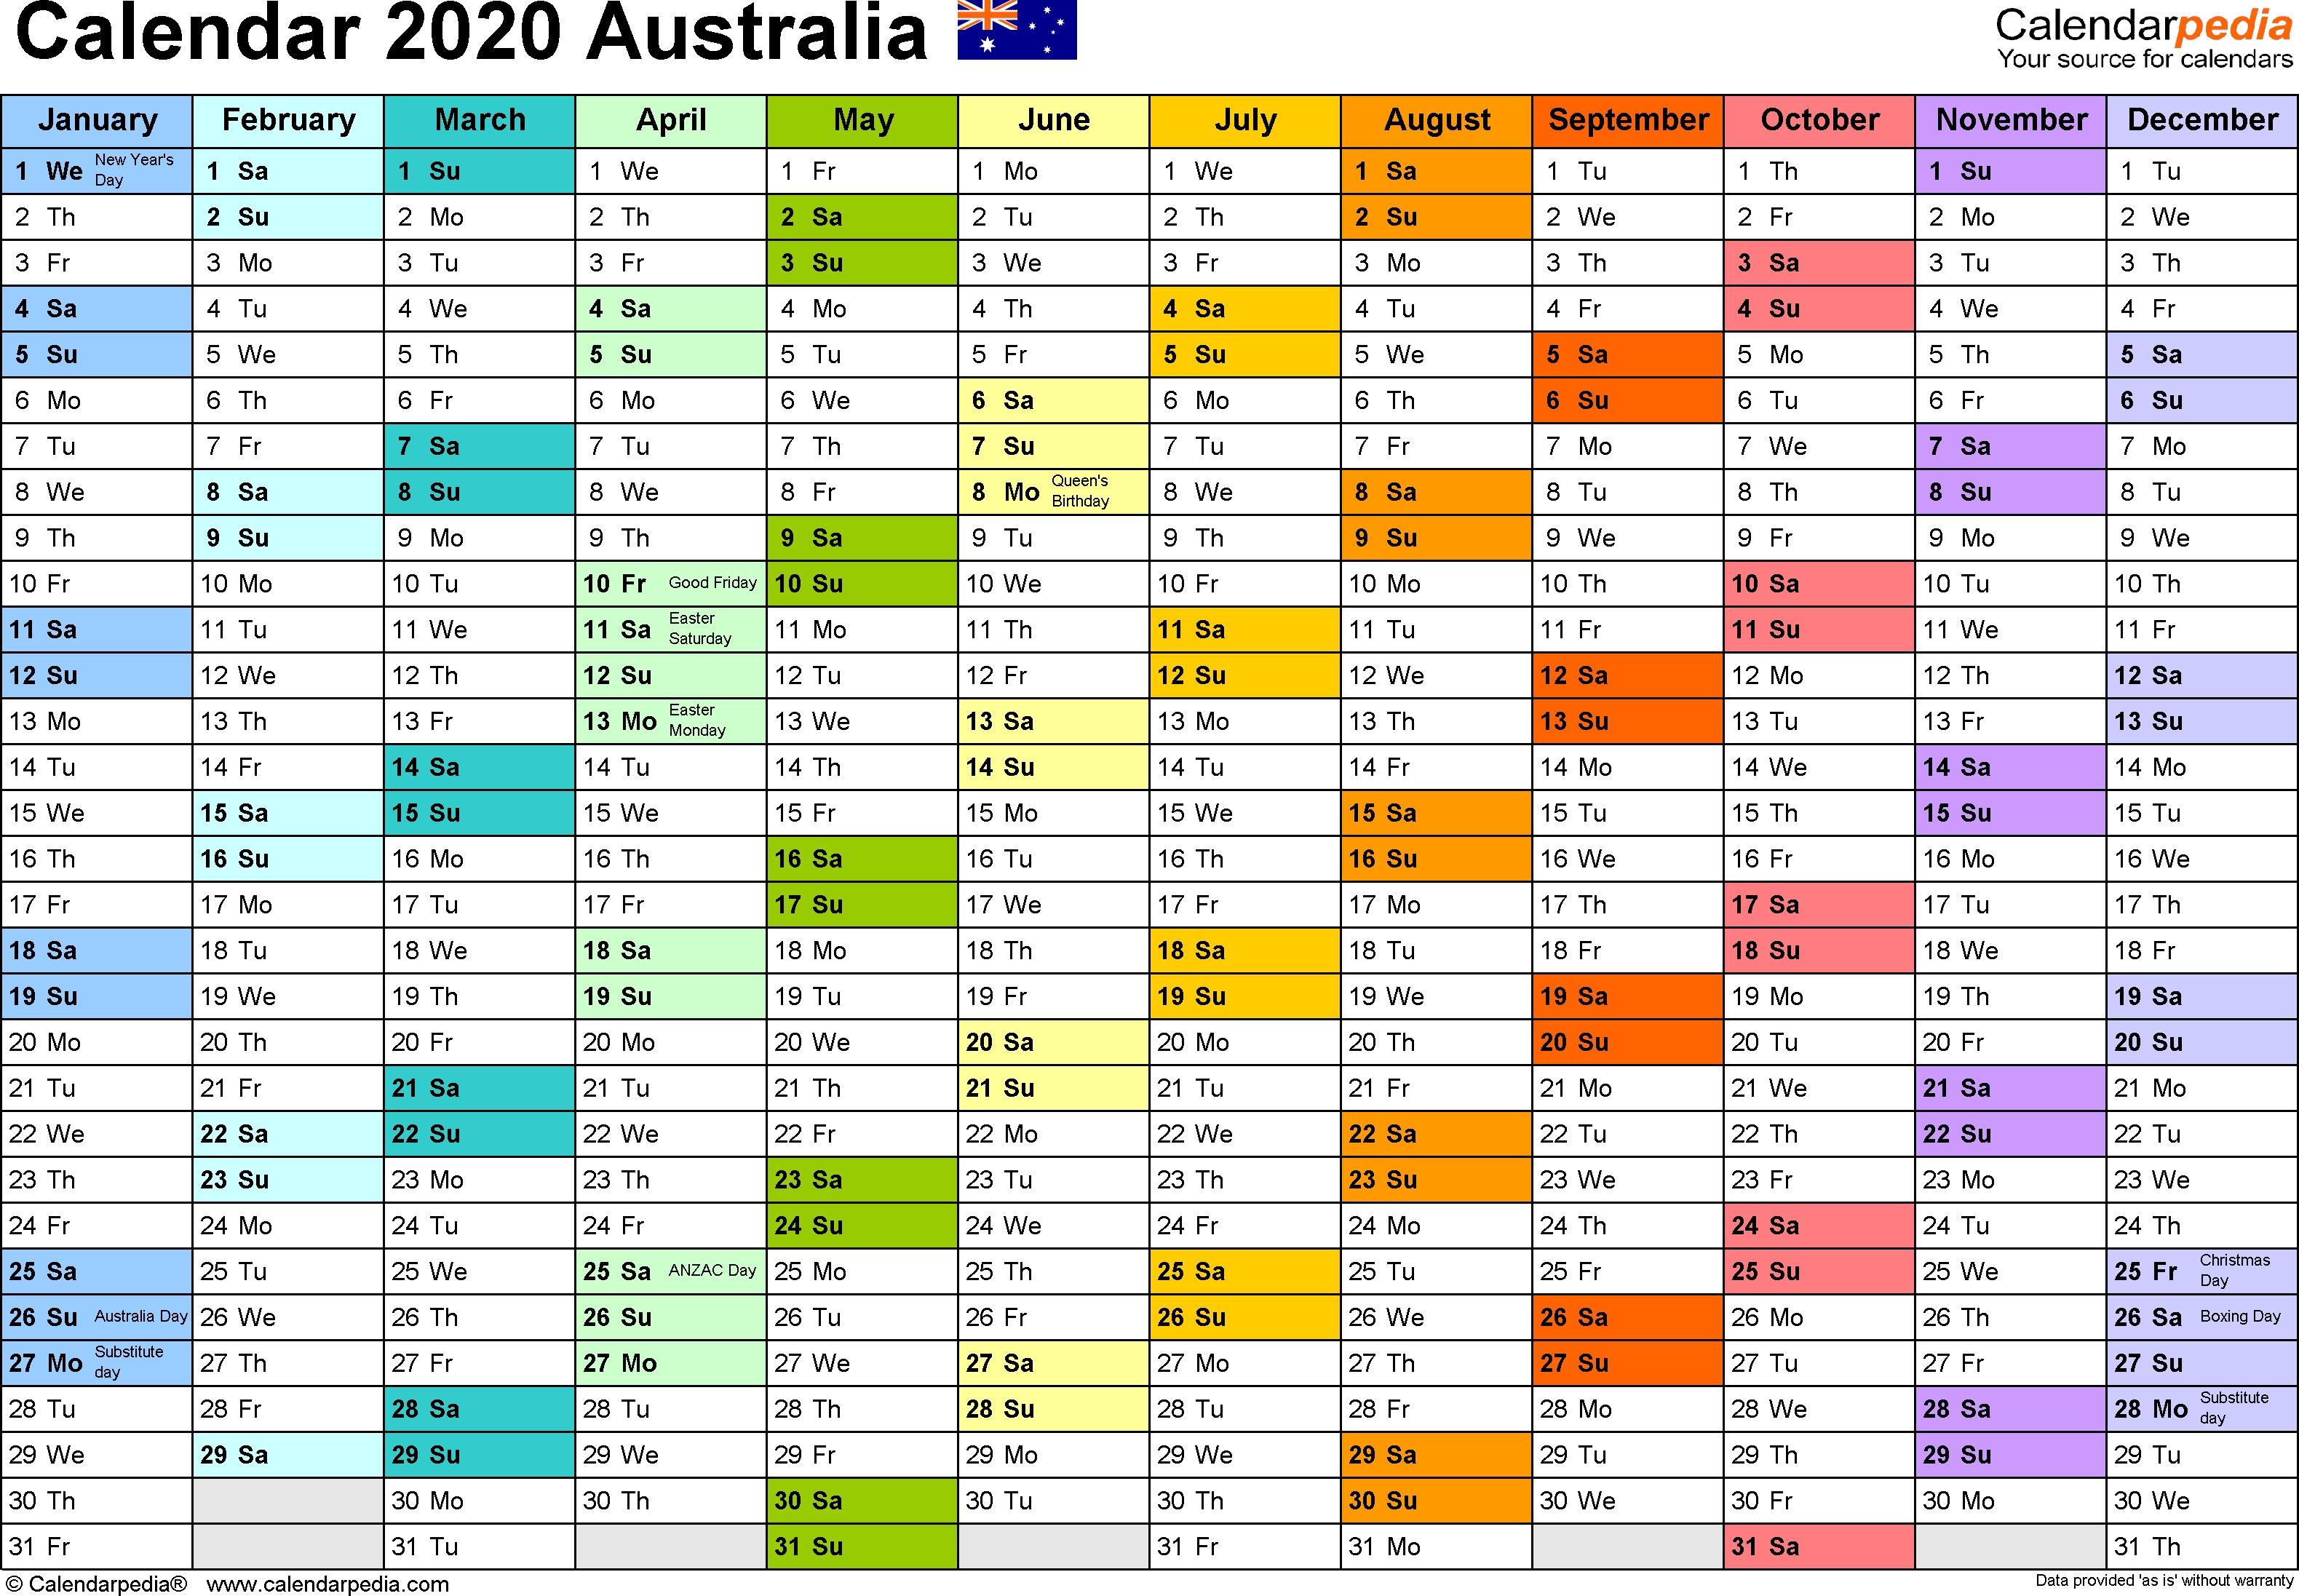 Australia Calendar 2020 - Free Printable Pdf Templates for Financial Calendar 2019- 2020 Printable.au